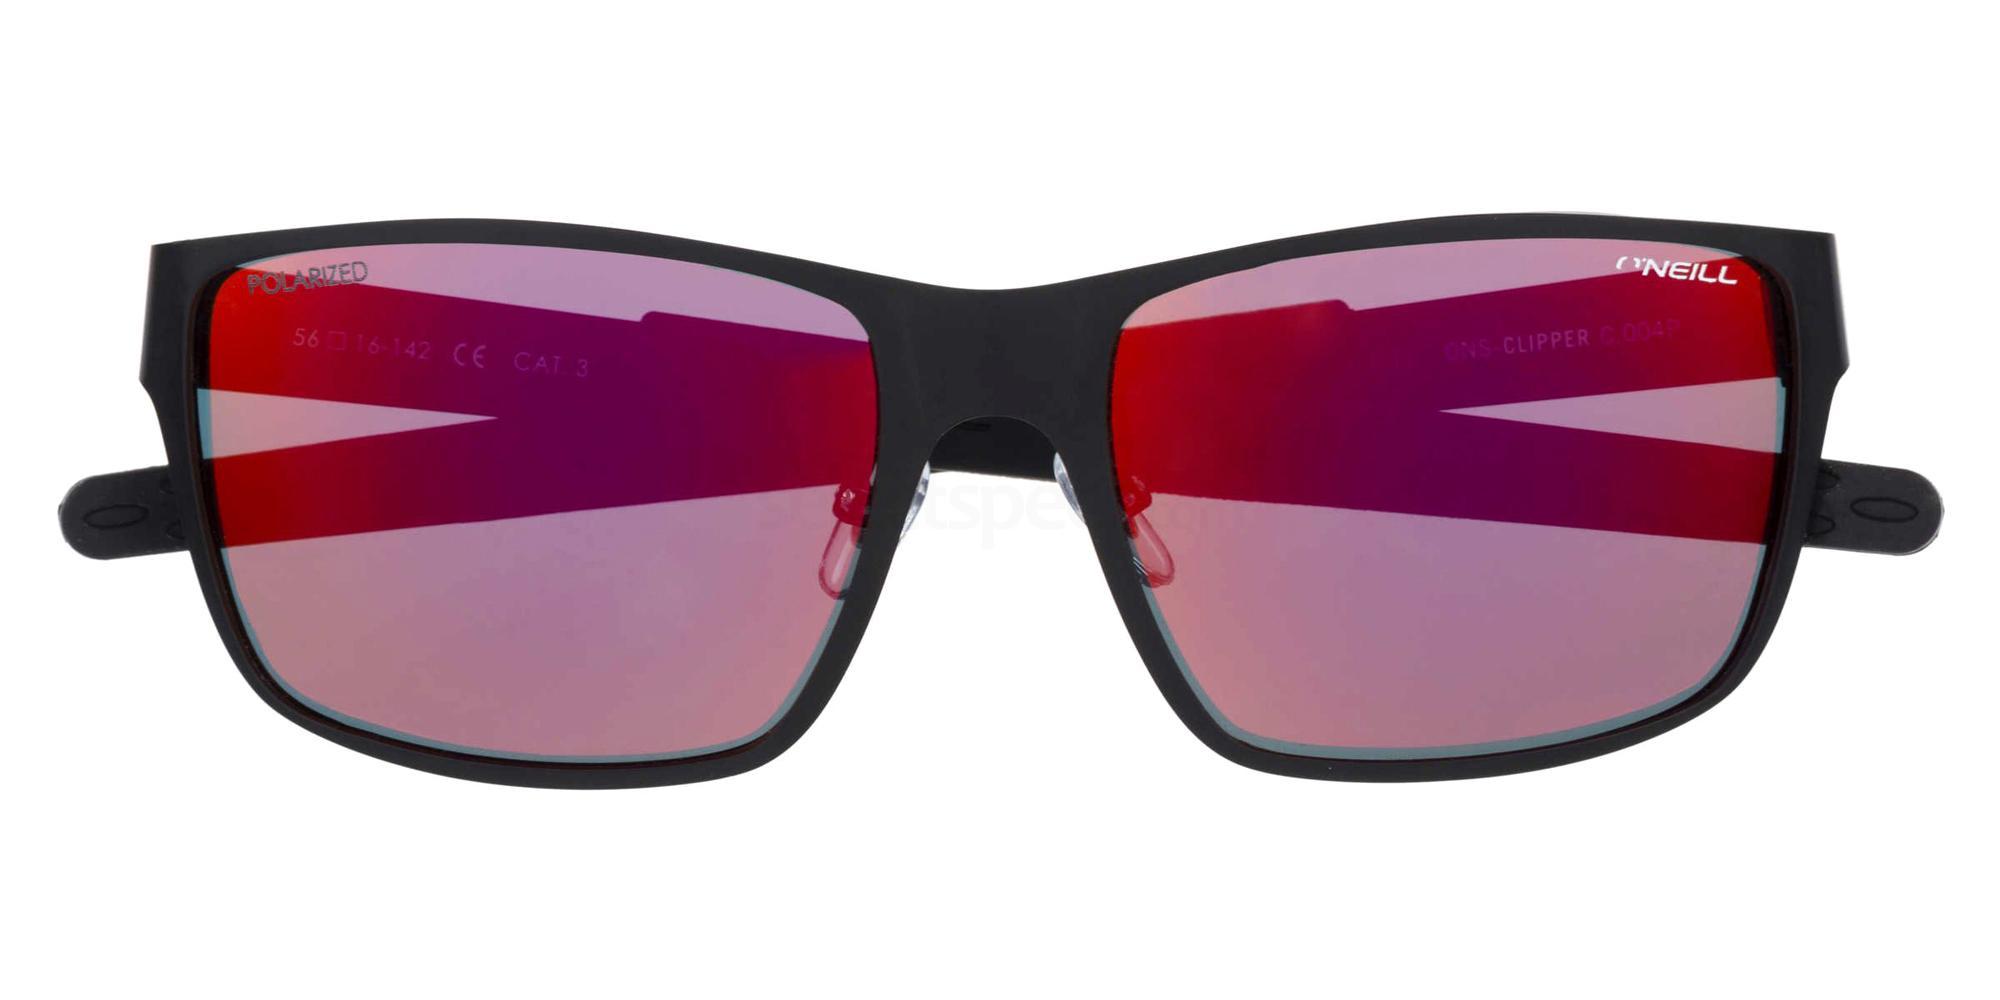 004P ONS-CLIPPER Sunglasses, O'Neill